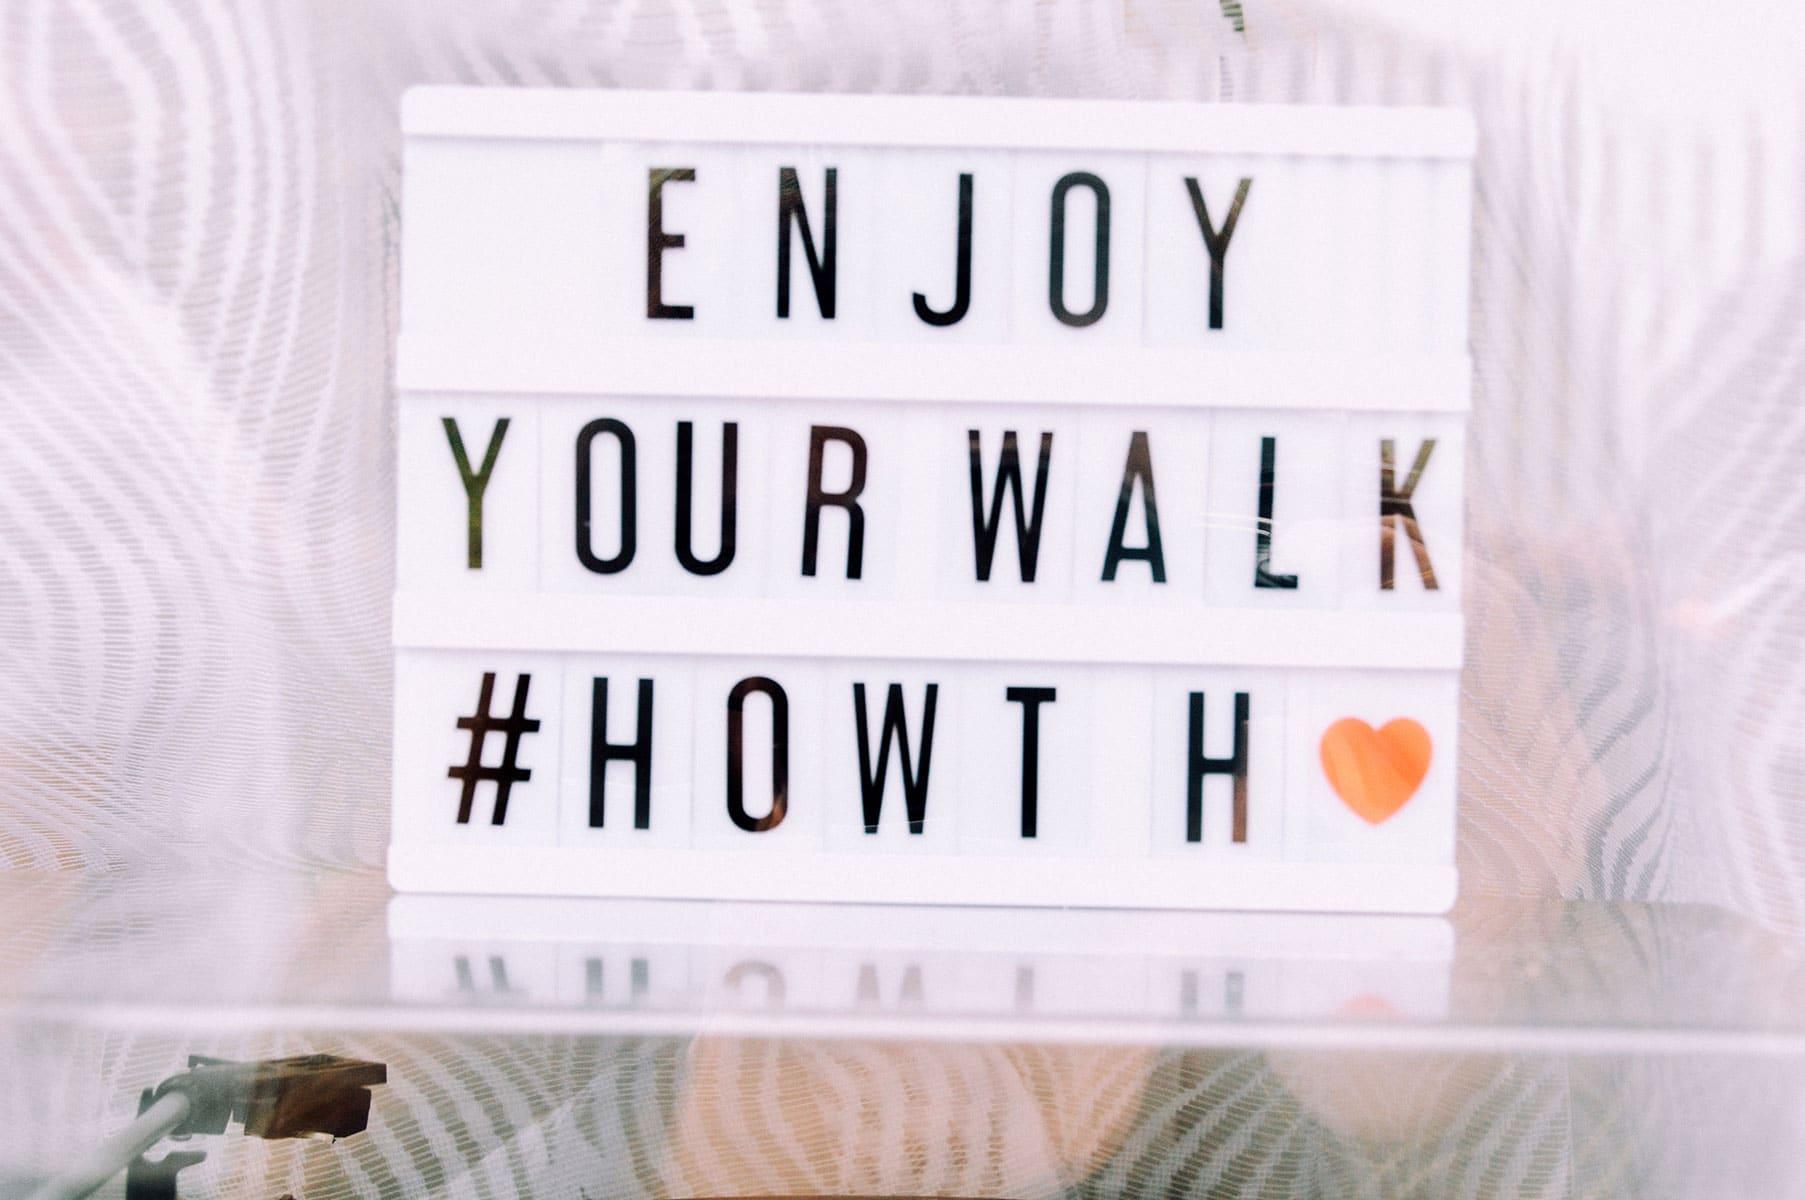 dublin_howth_walk